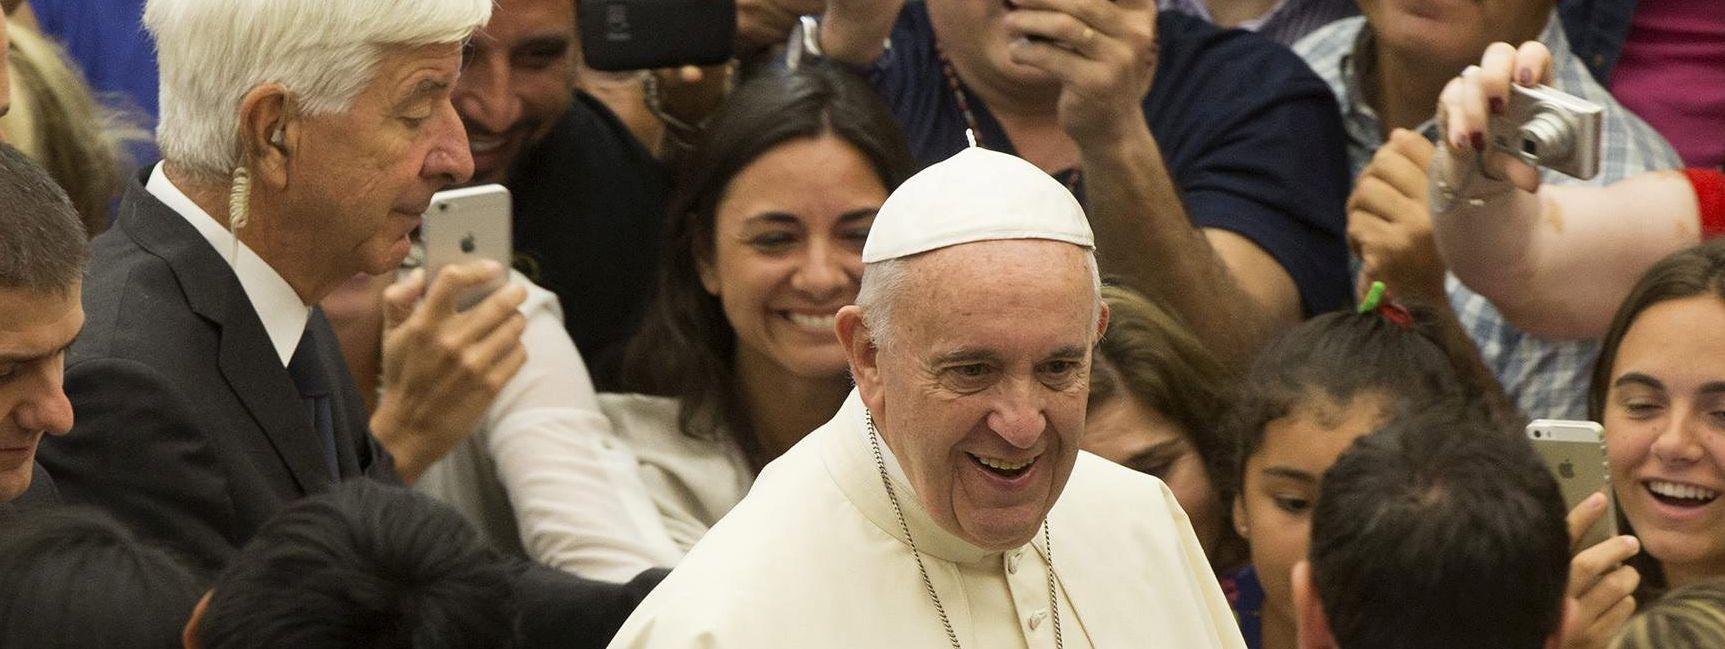 VIDEO: Papa Franjo svečanom misom završio posjet SAD-u